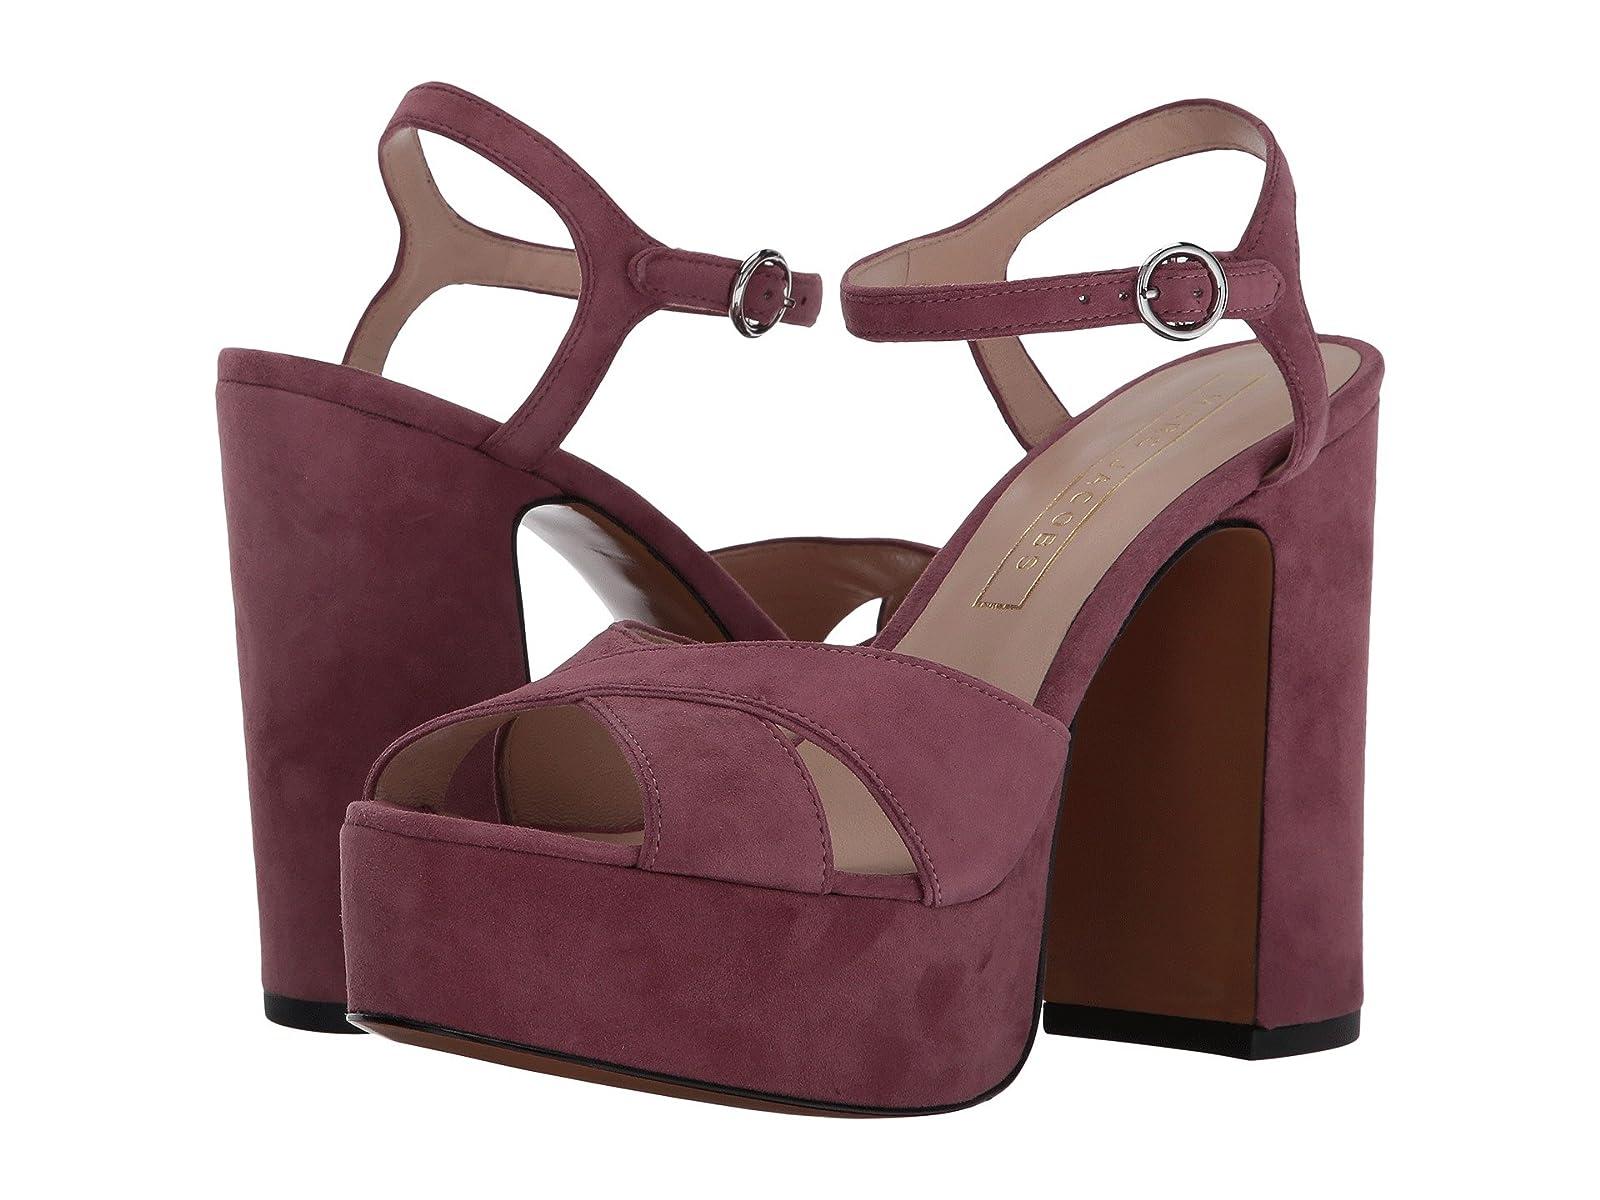 Marc Jacobs Lust Platform SandalCheap and distinctive eye-catching shoes